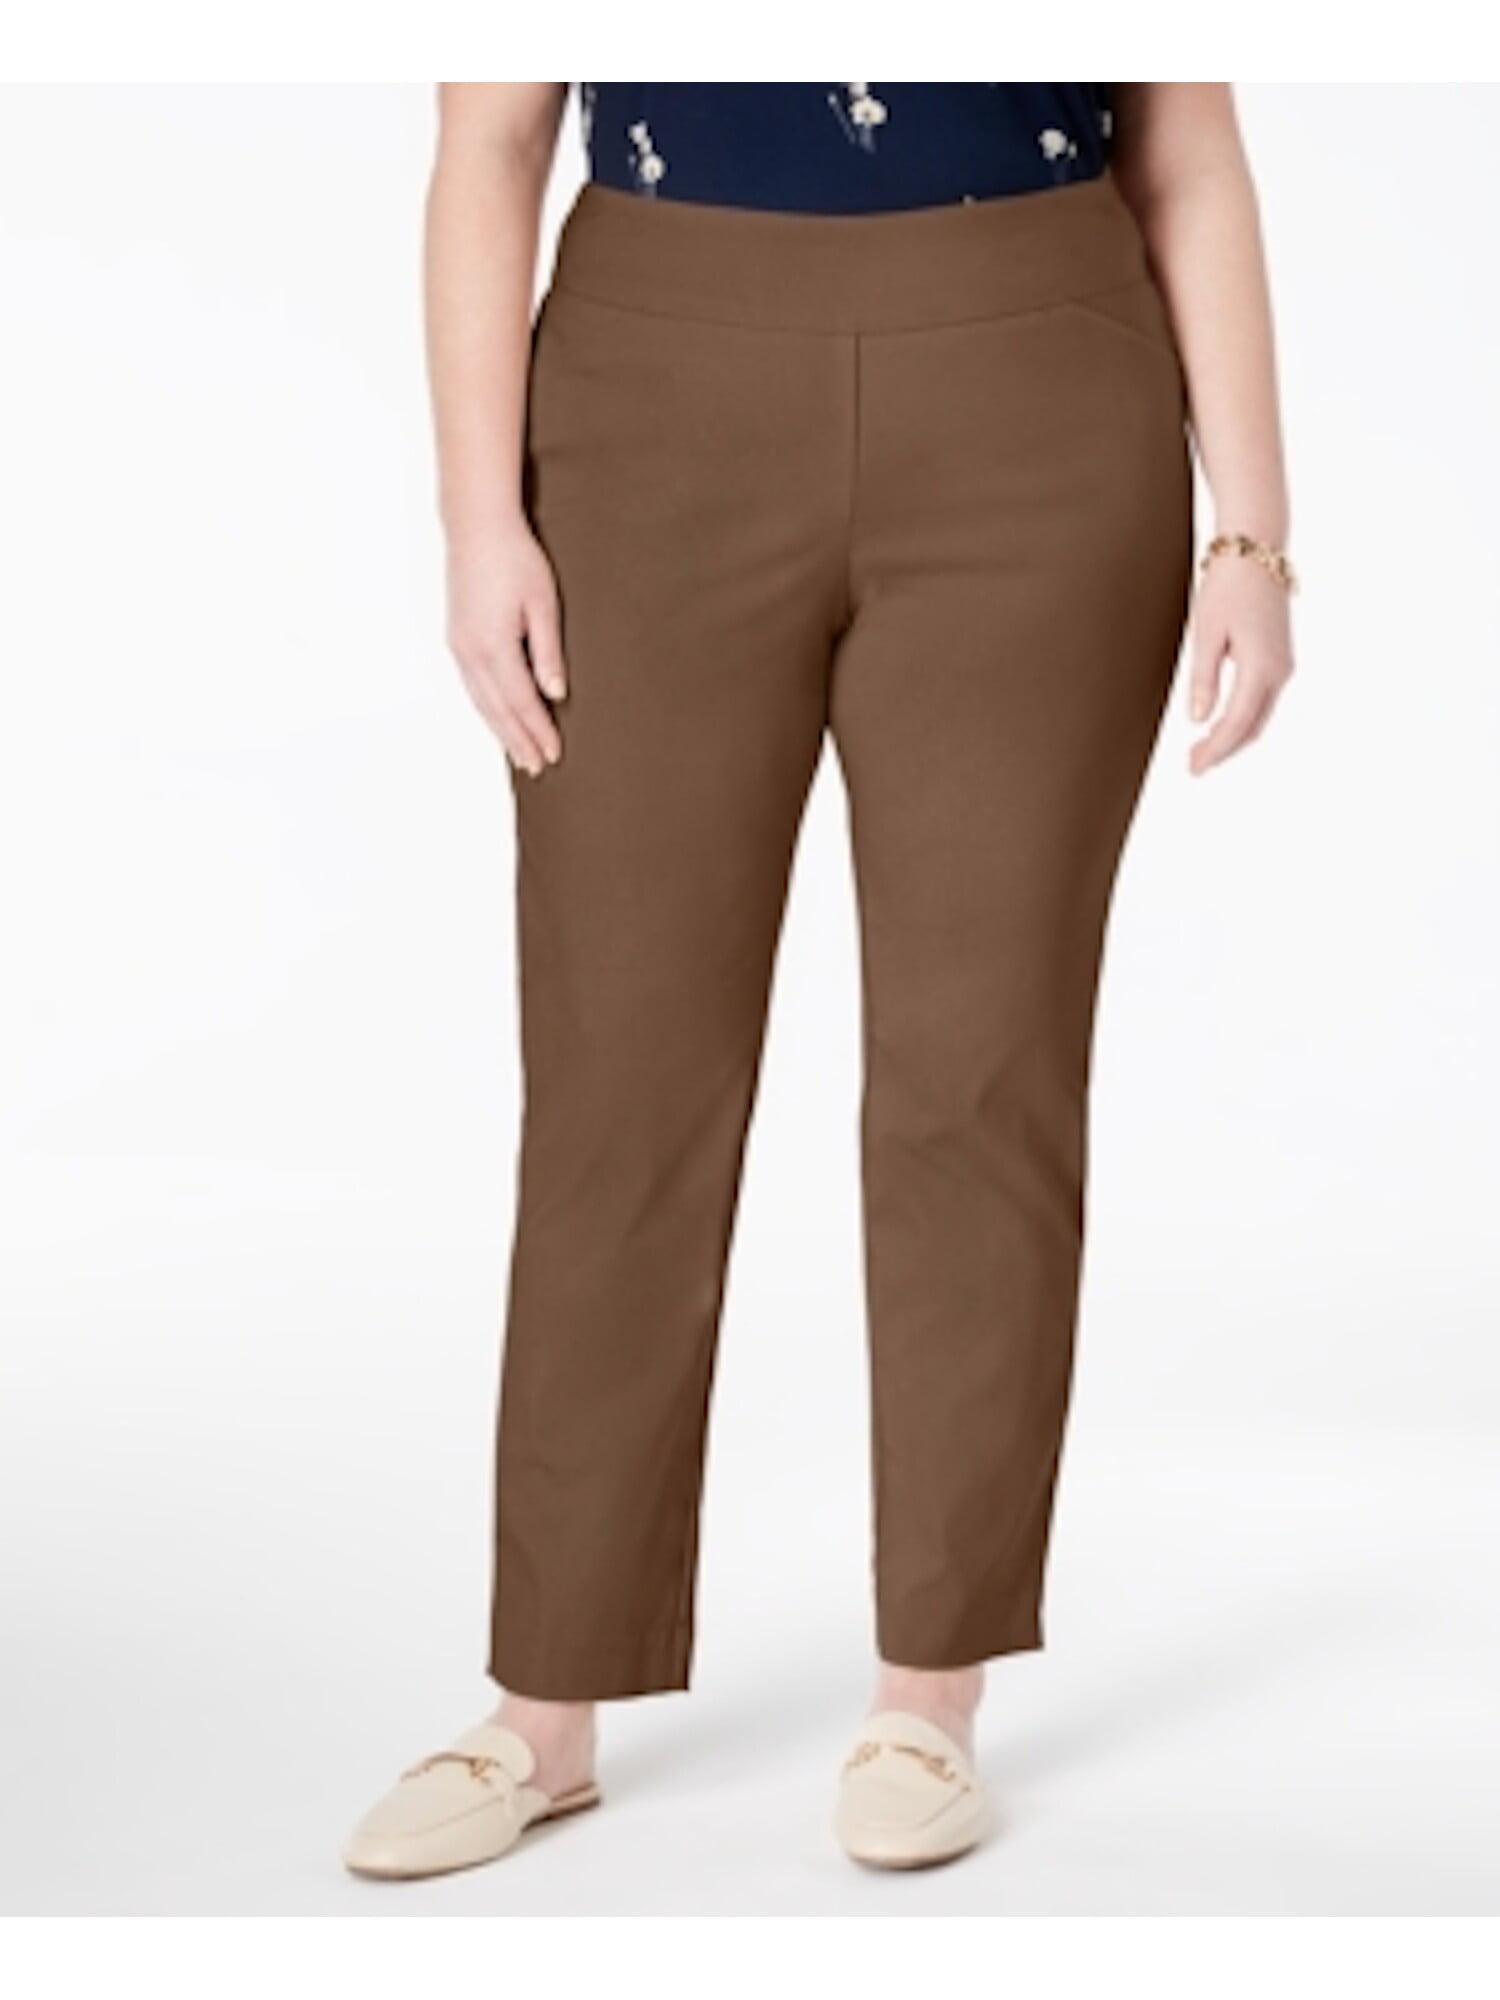 Charter Club Women/'s Size 4P Black Sedona Dust Solid Ankle Pants Slim-Leg $69 J